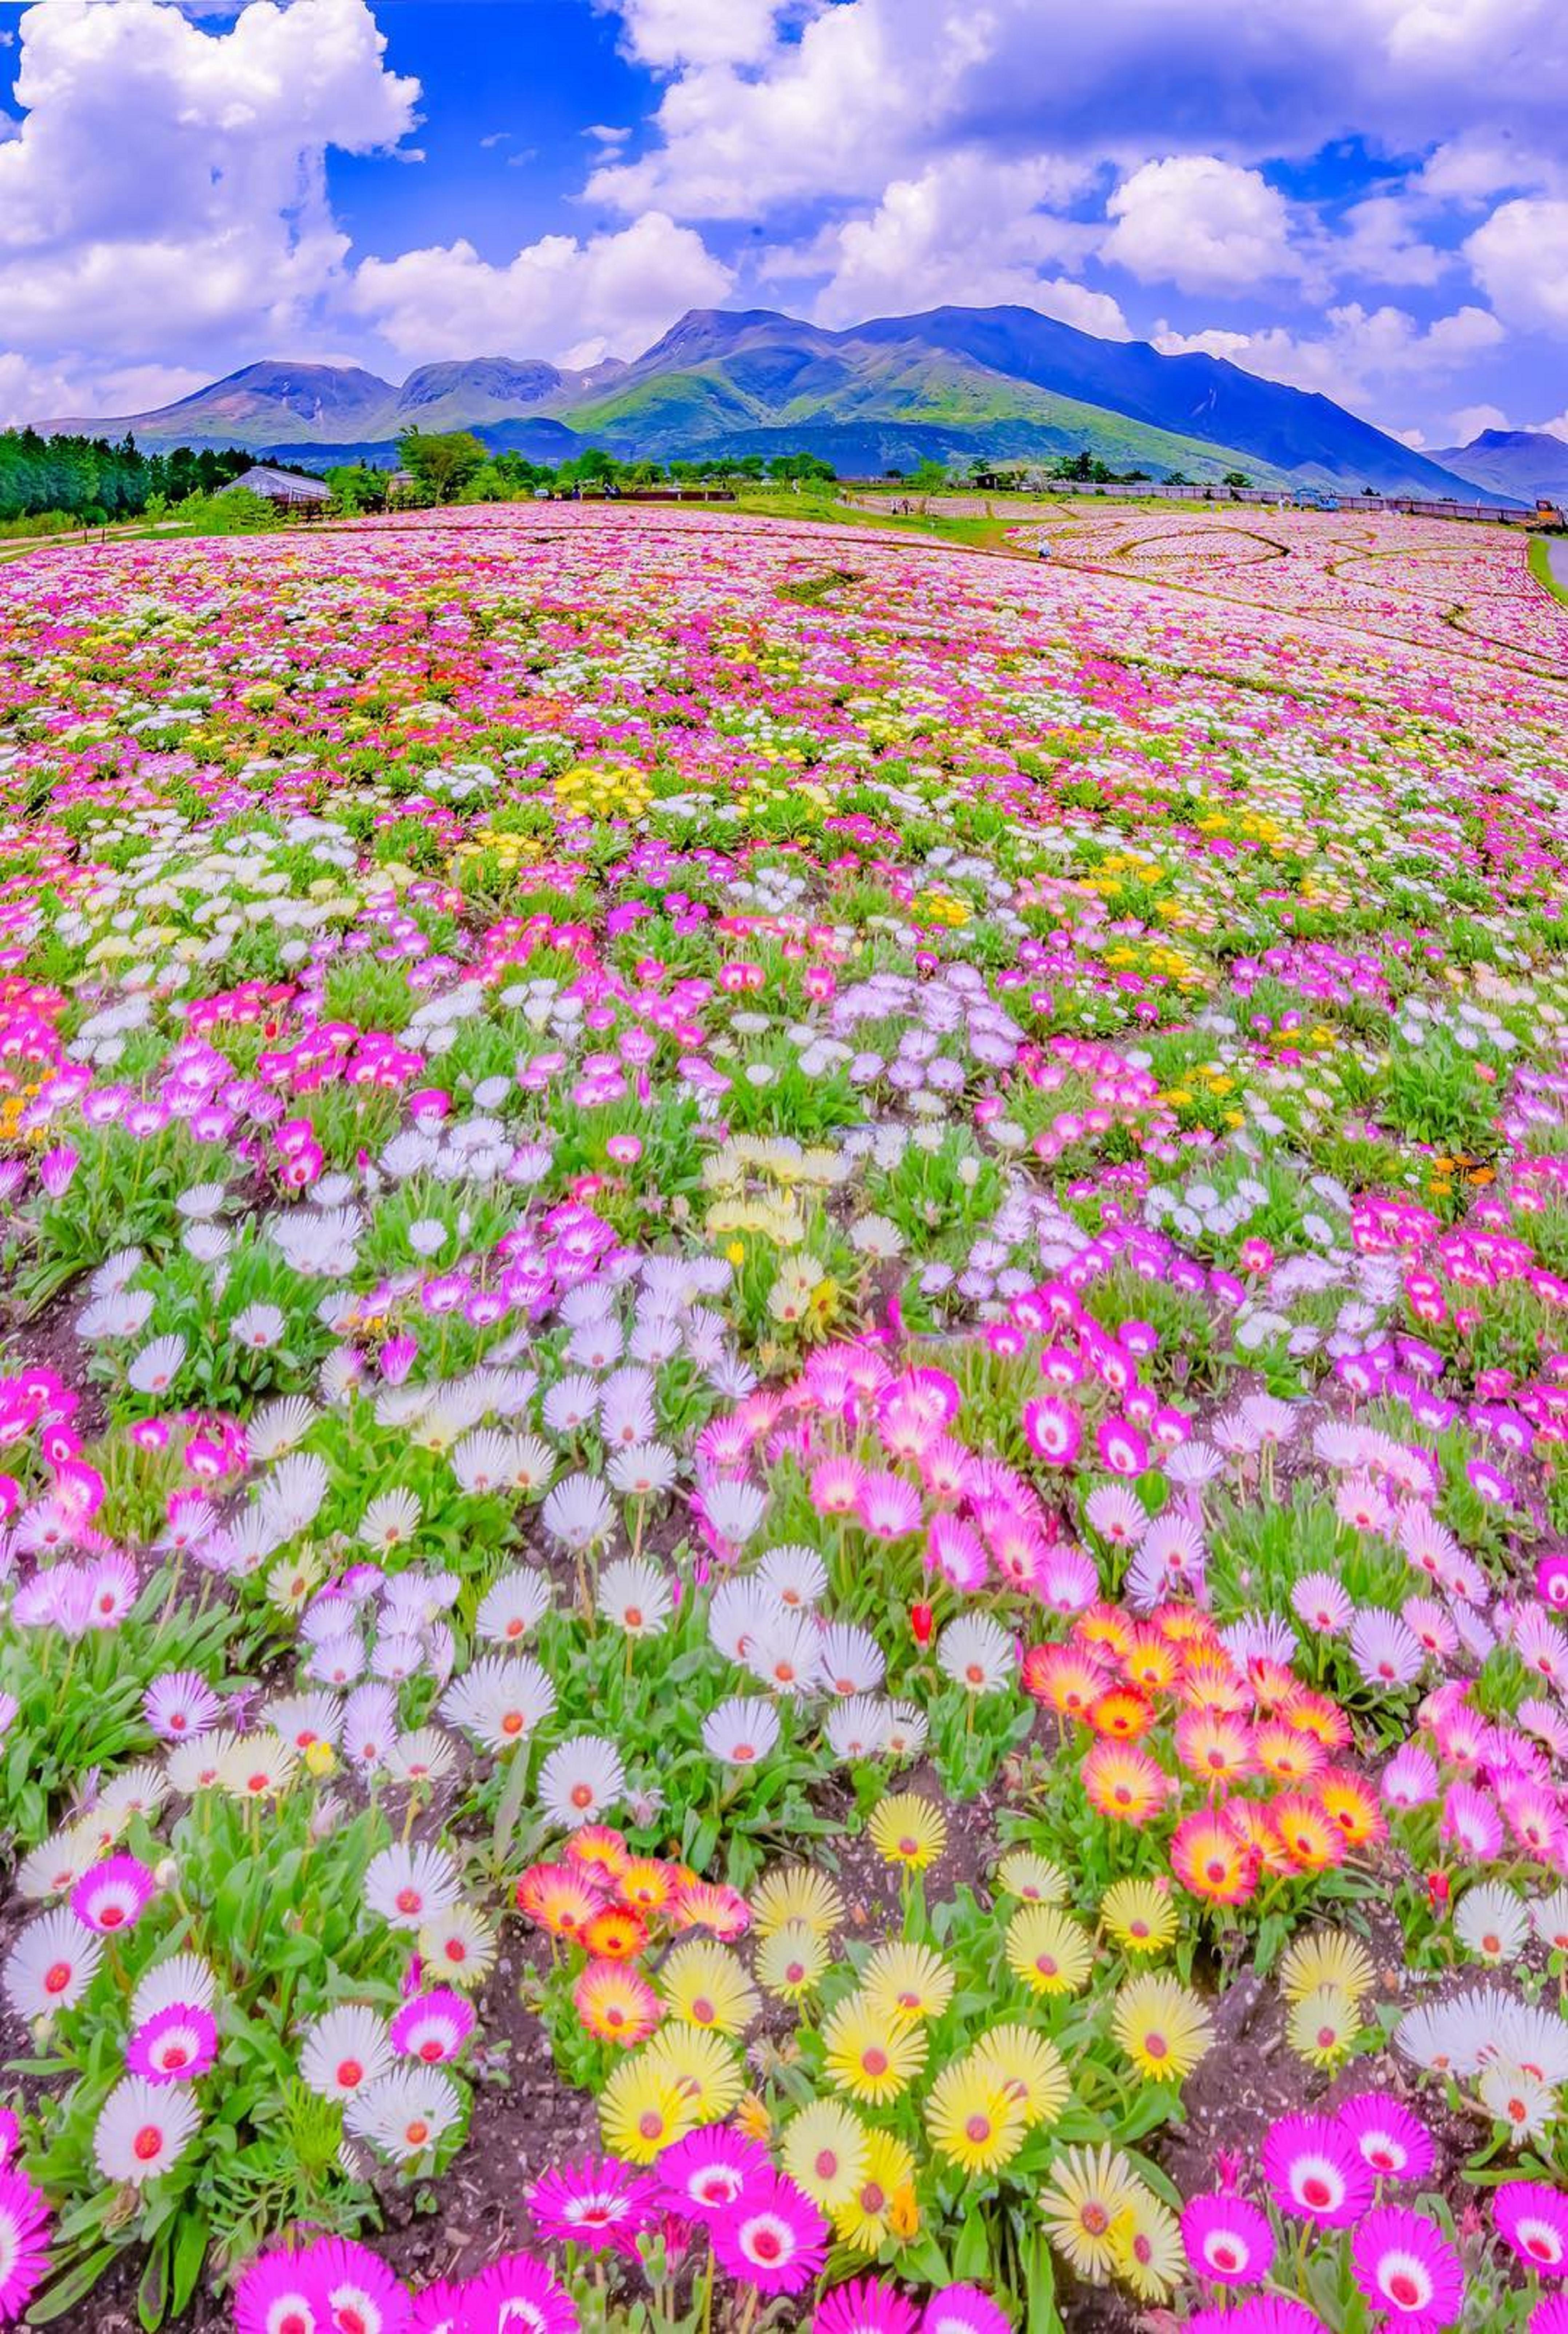 Kuju Flower Park Japan Beautiful Landscapes Nature Nature Photography